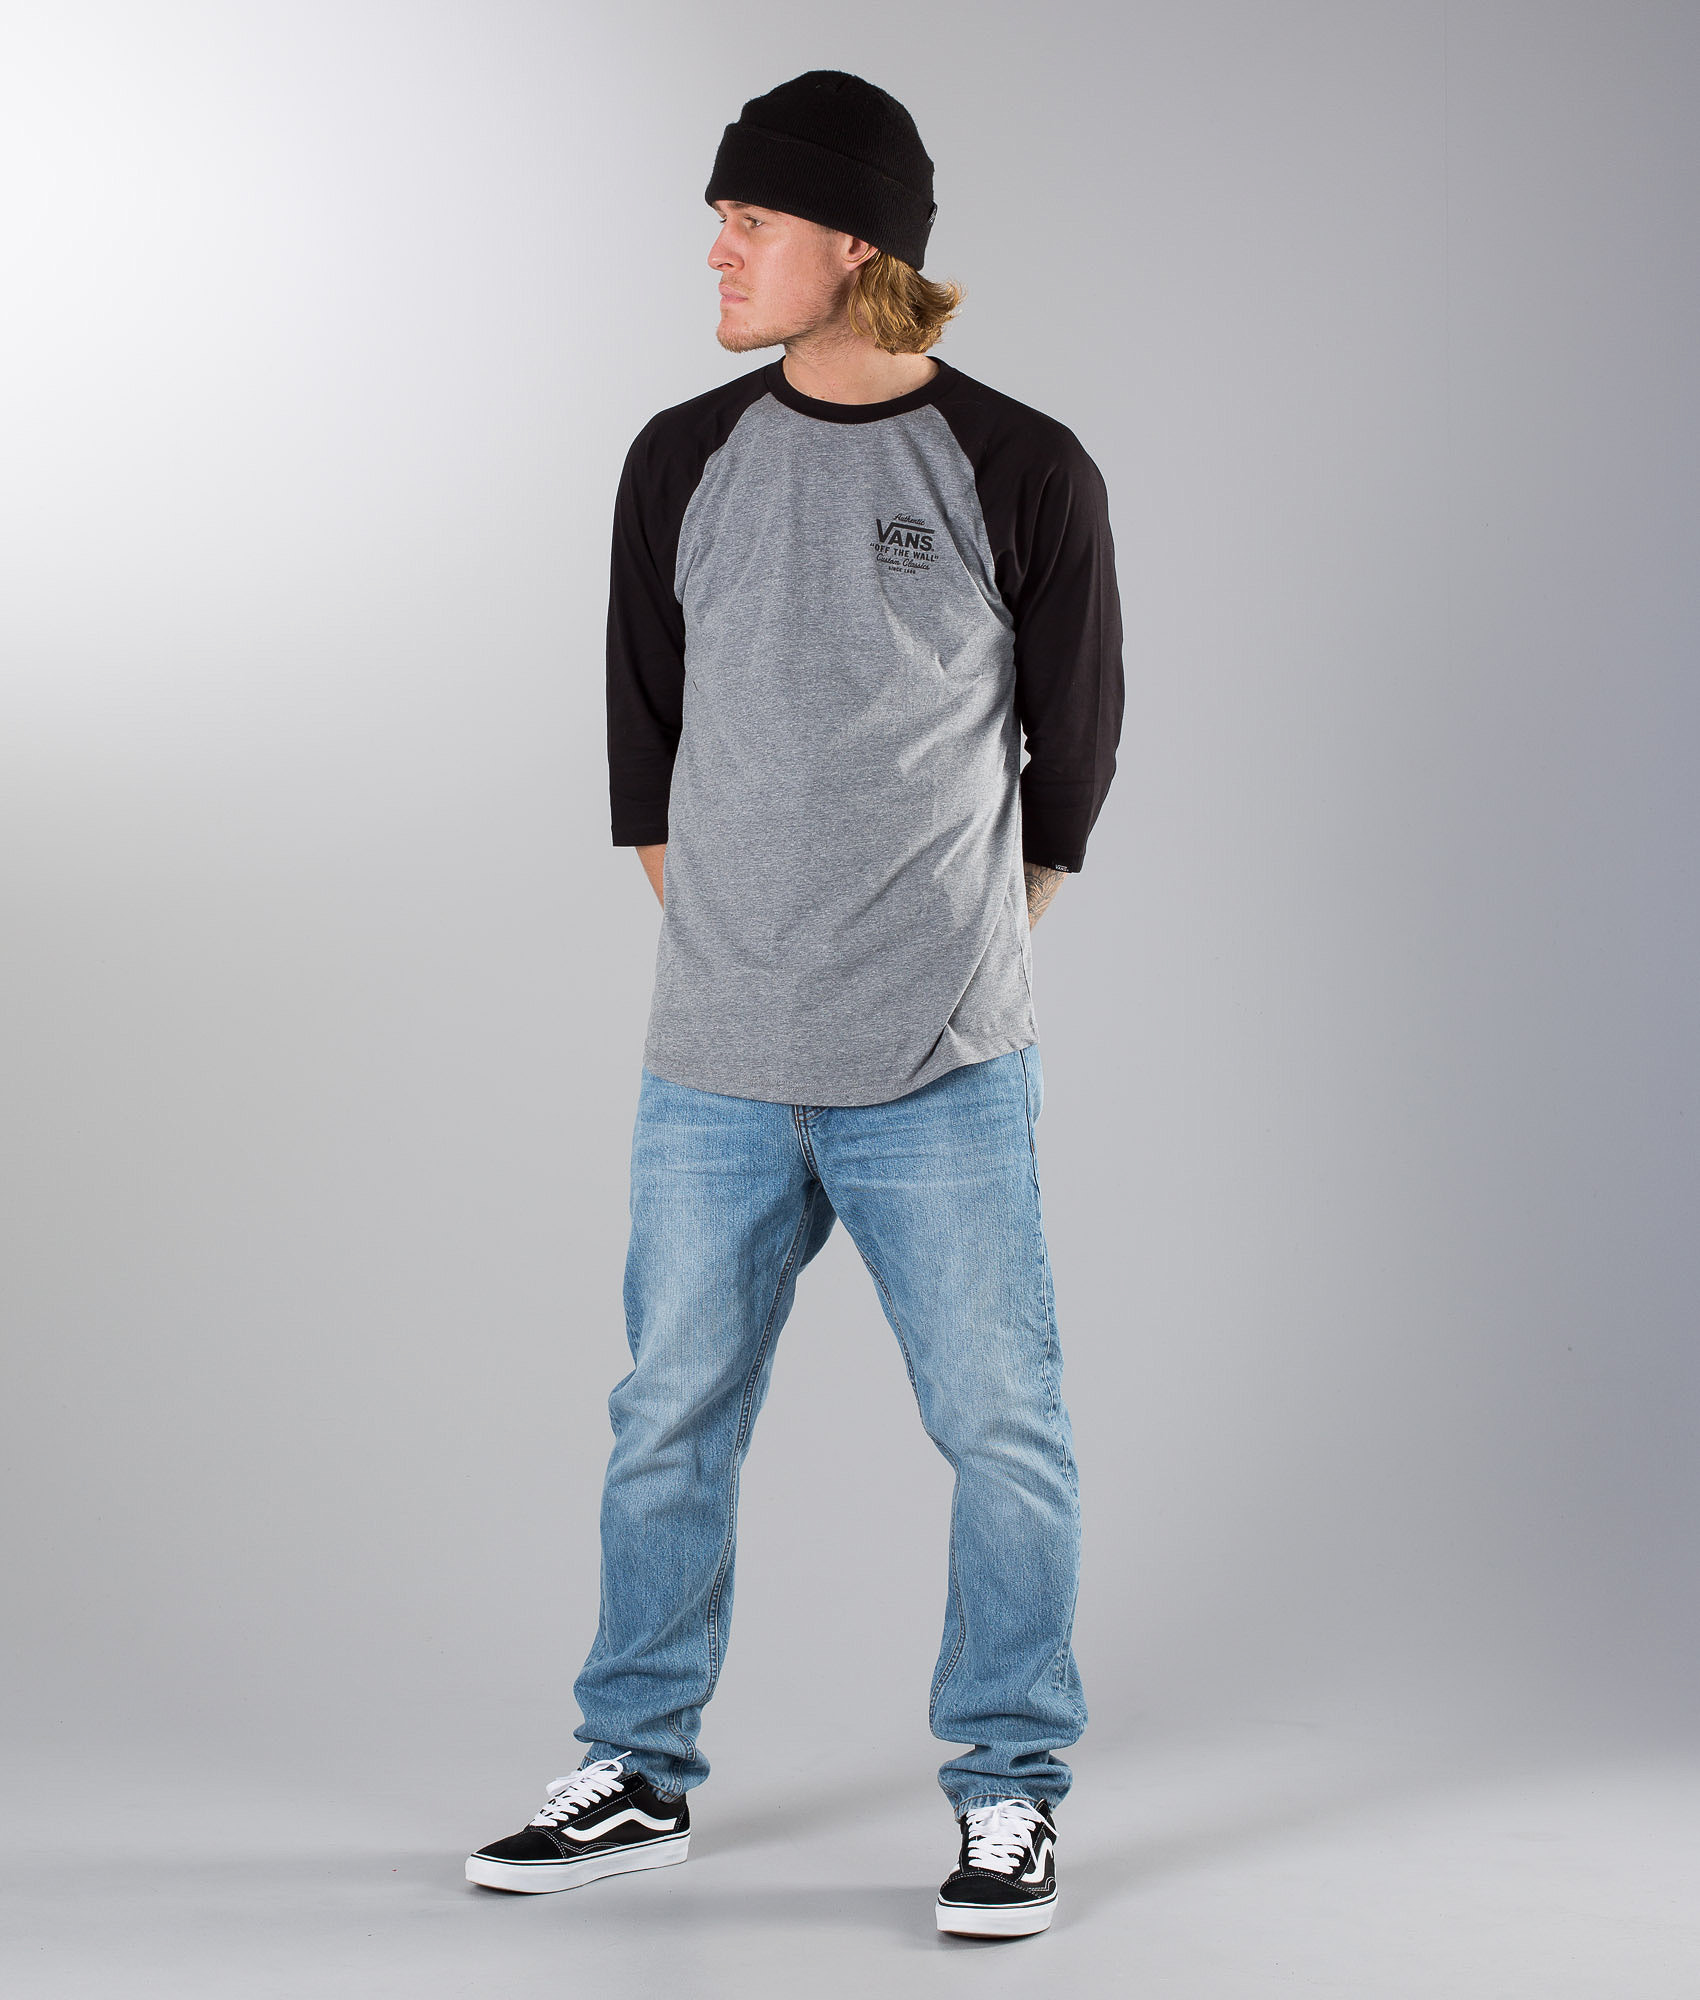 016c1920618 Vans Holder St Raglan T-shirt Heather Grey-Black - Ridestore.com